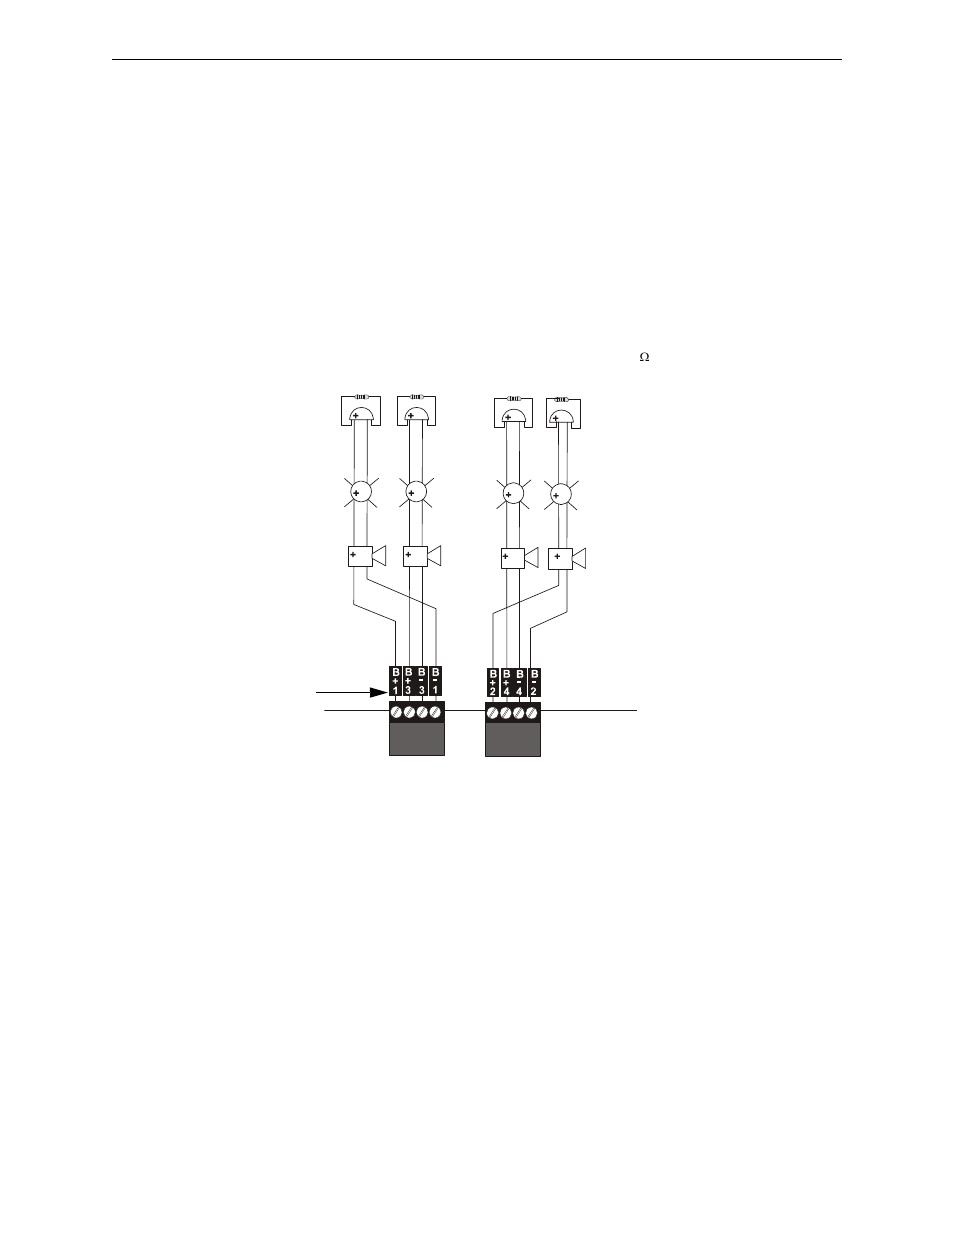 medium resolution of 5 notification appliance circuits 1 style y class b nac wiring notification